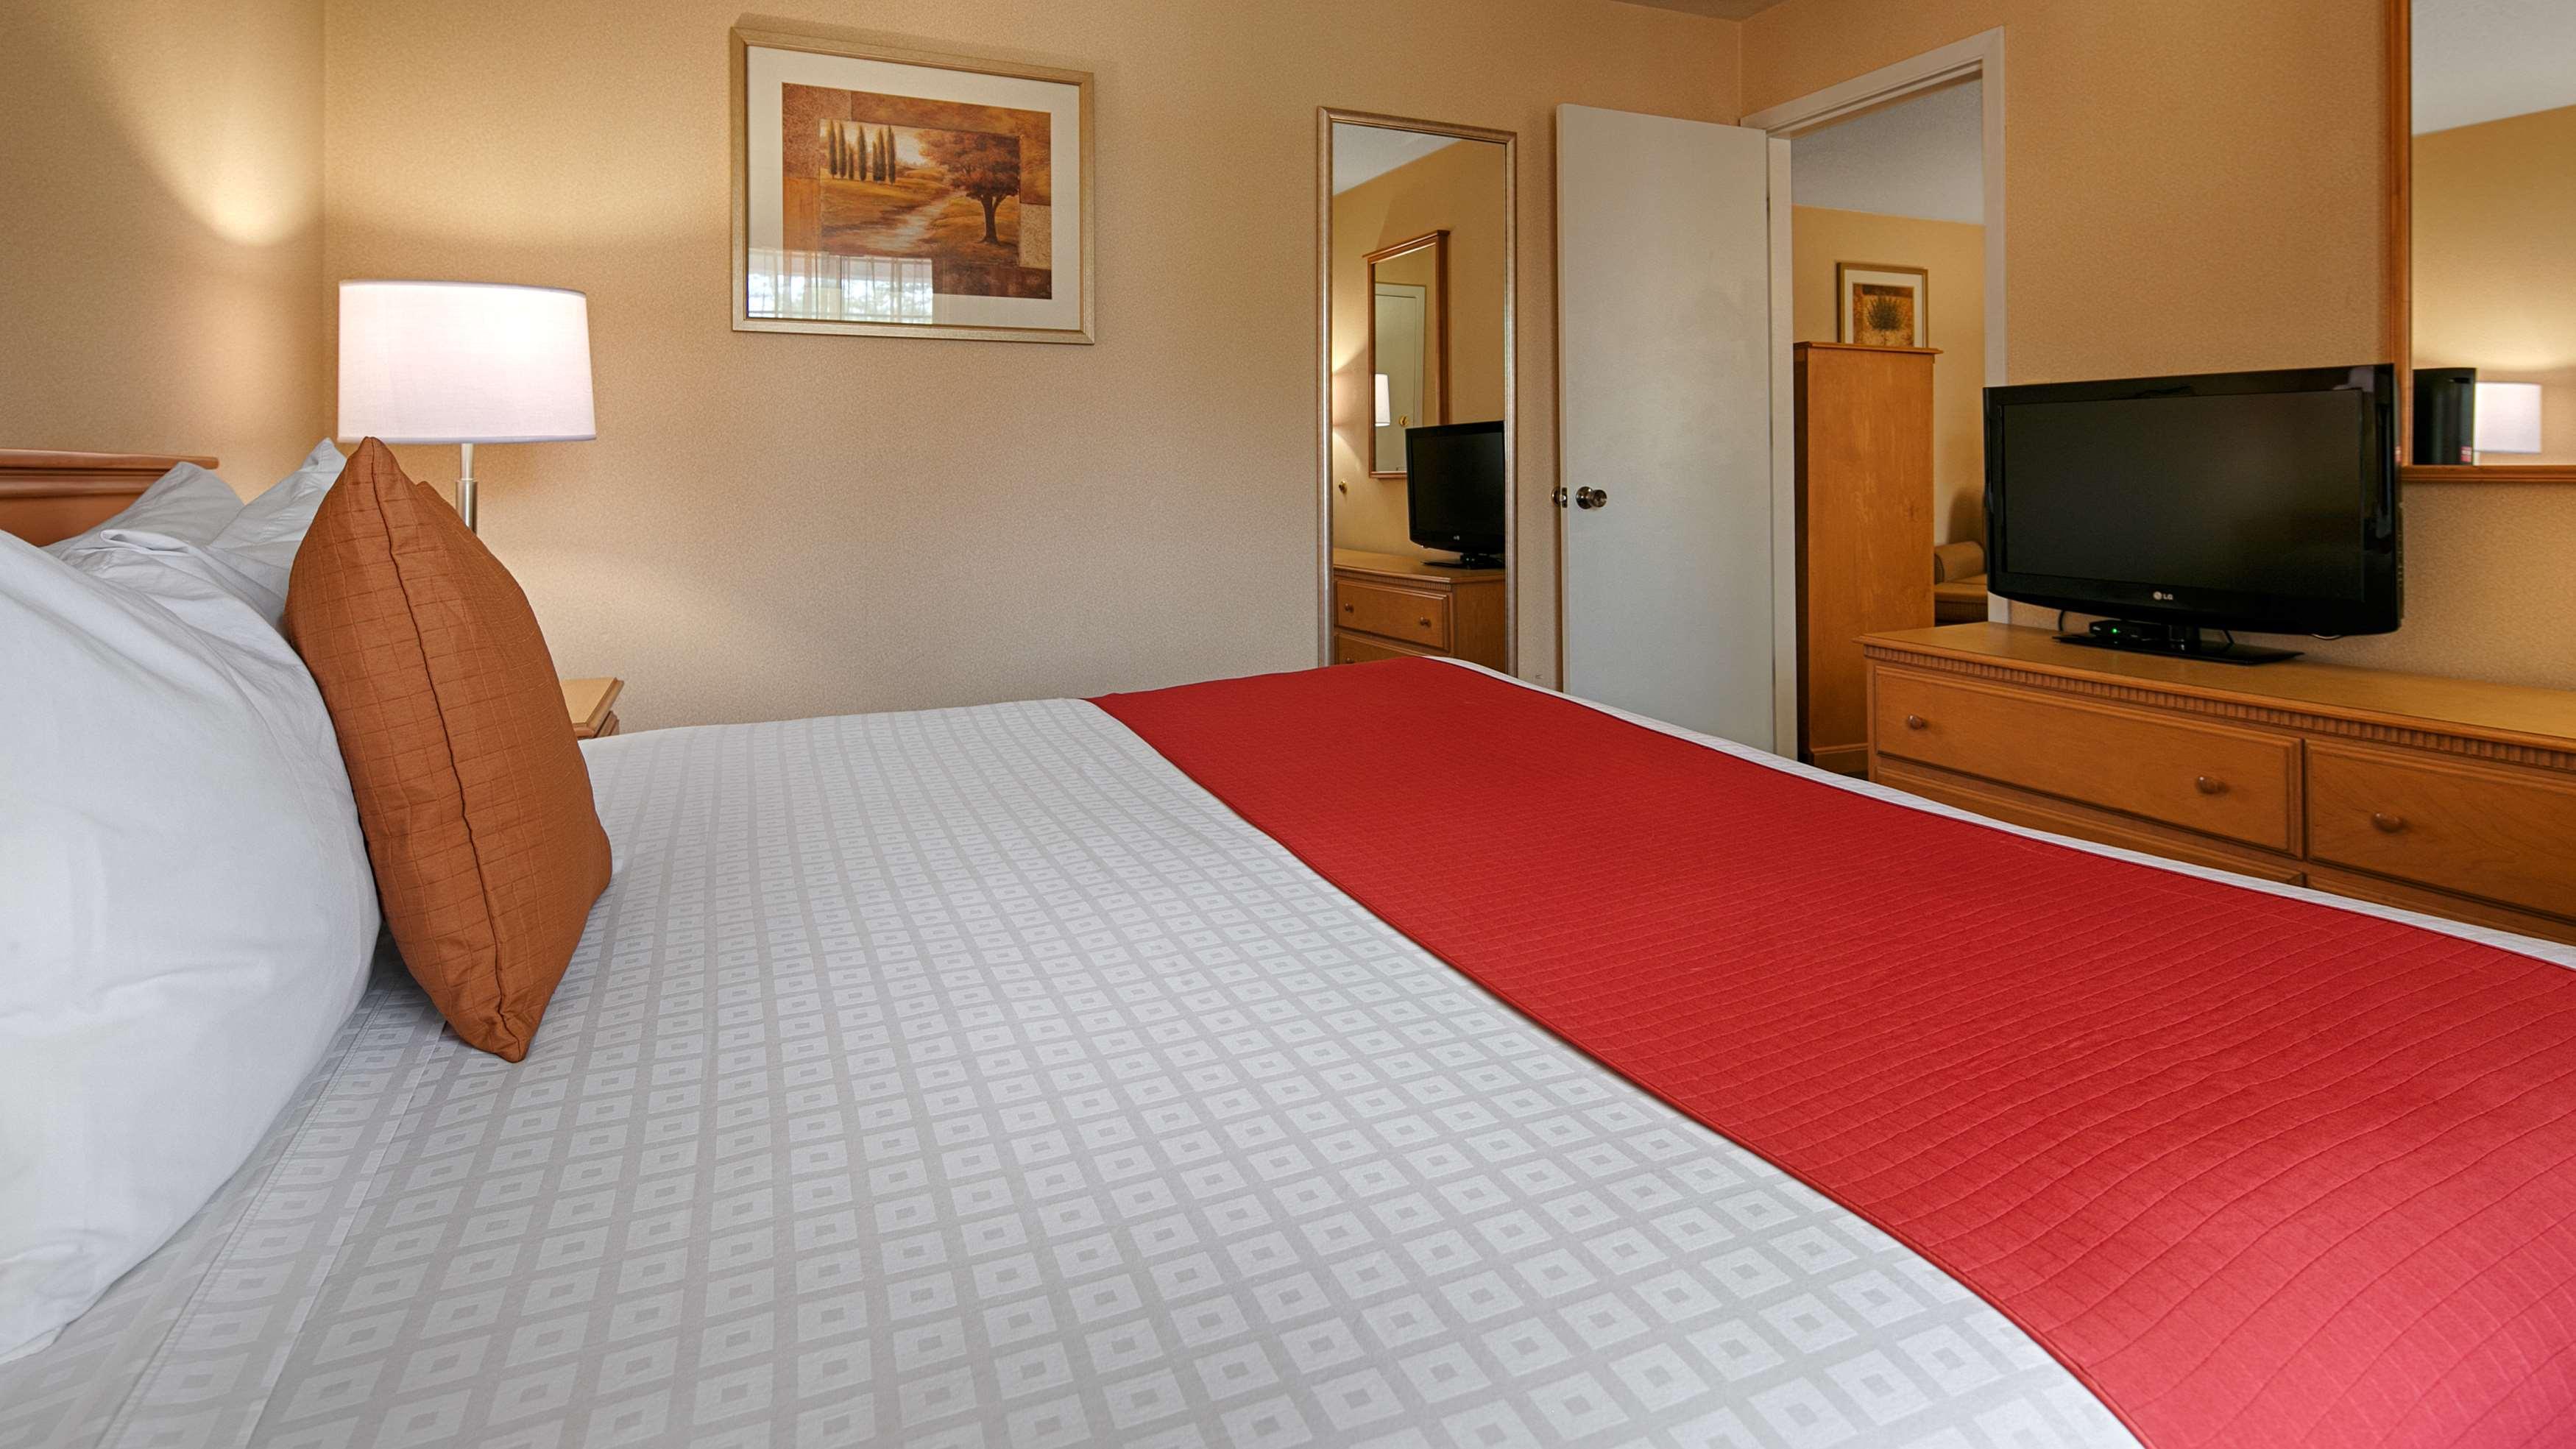 Best Western Horizon Inn image 36